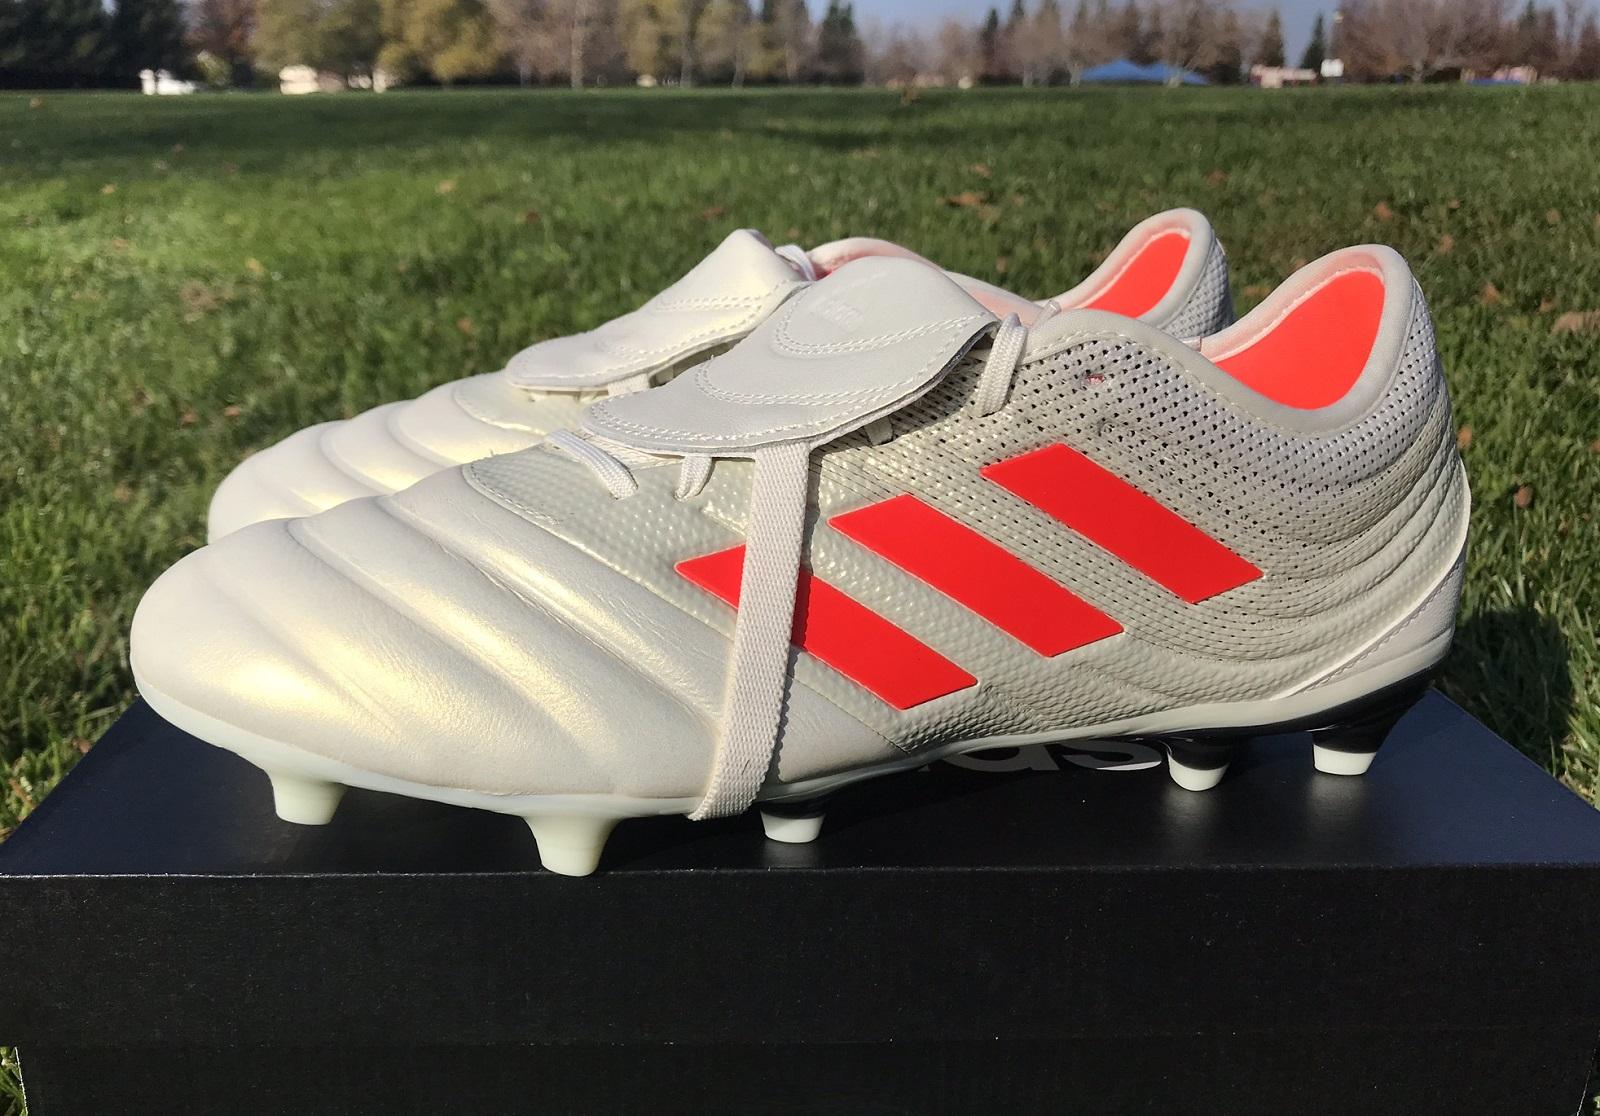 96d45d854 adidas Release Copa Gloro 19.2